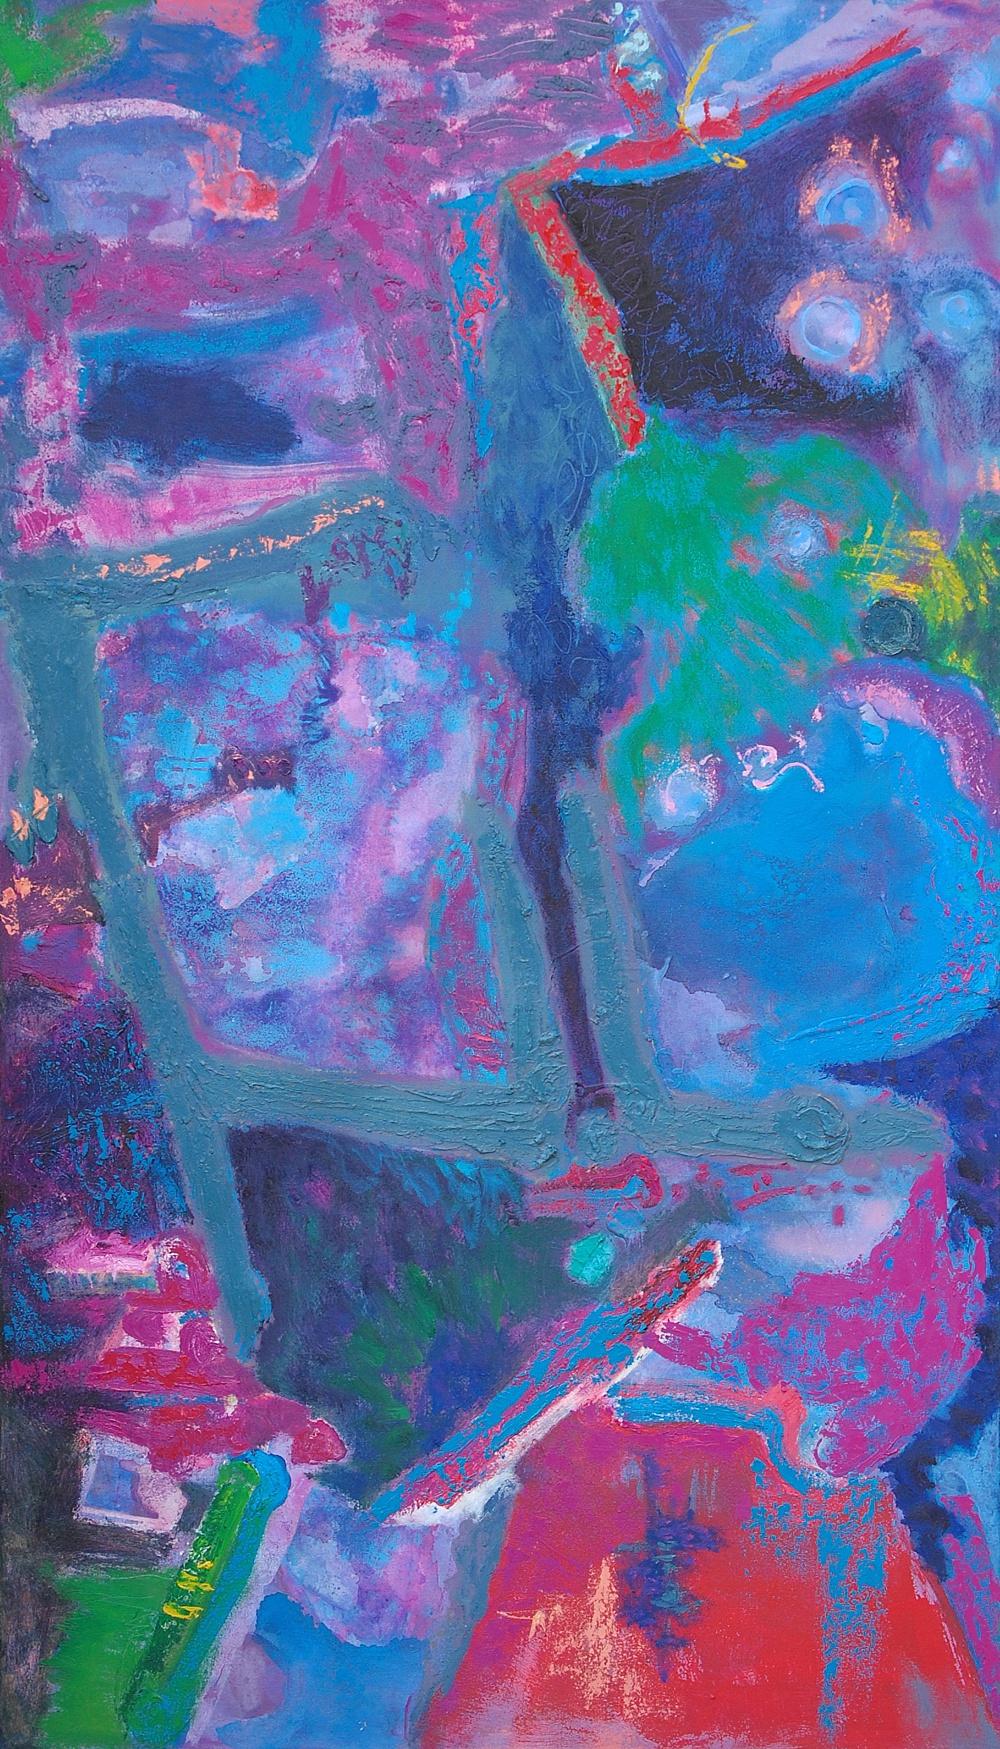 abstract-art-oil-acrylic-on-canvas-mixed-media-london-fine-art-photographer-lily-sawyer-photo